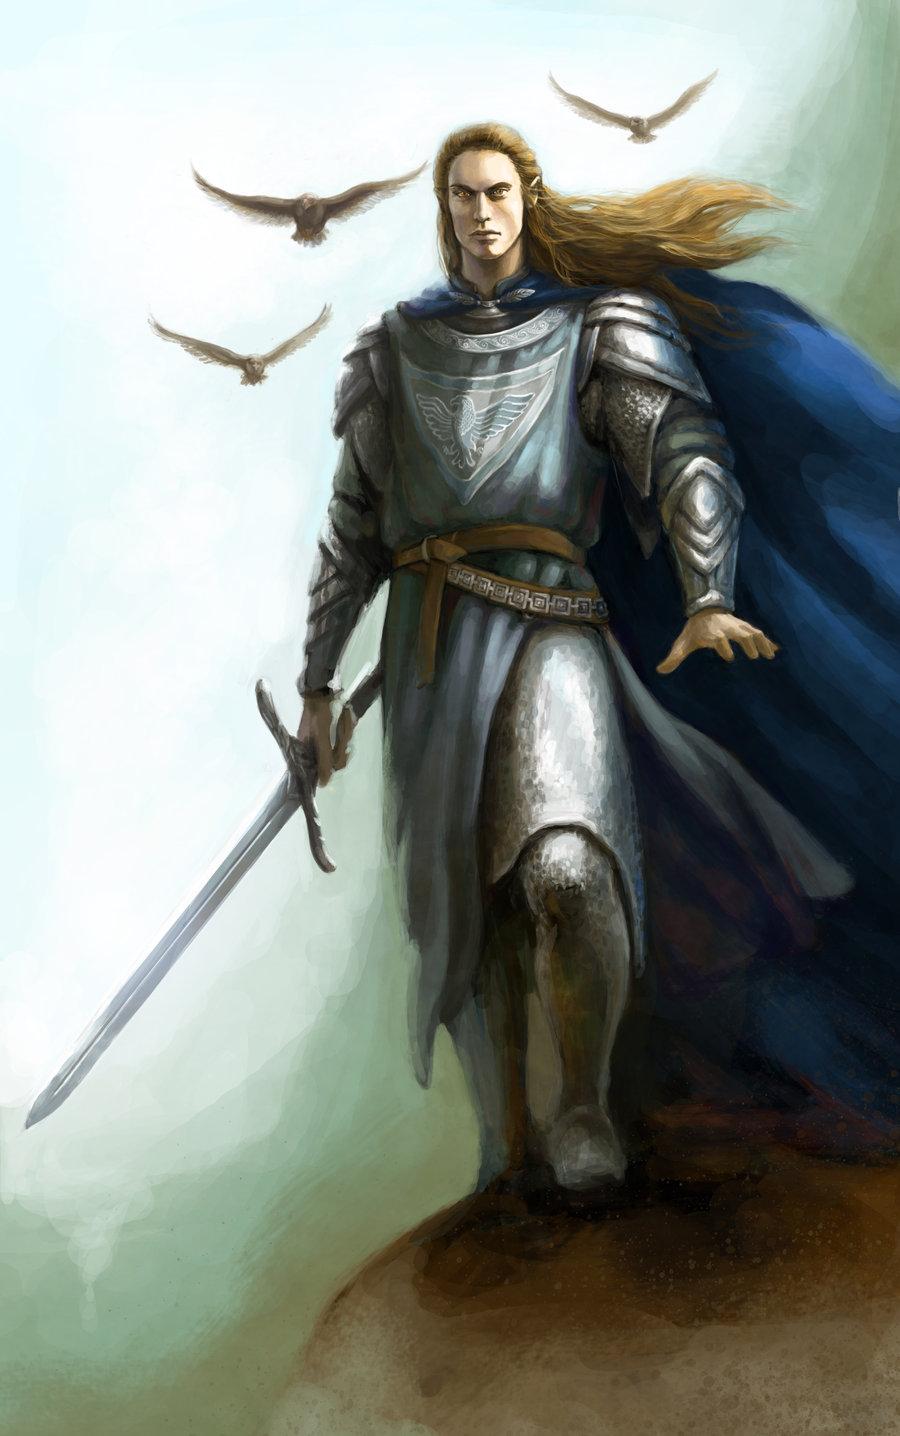 Tuuliky_-_Lord_of_the_Eagles.jpg